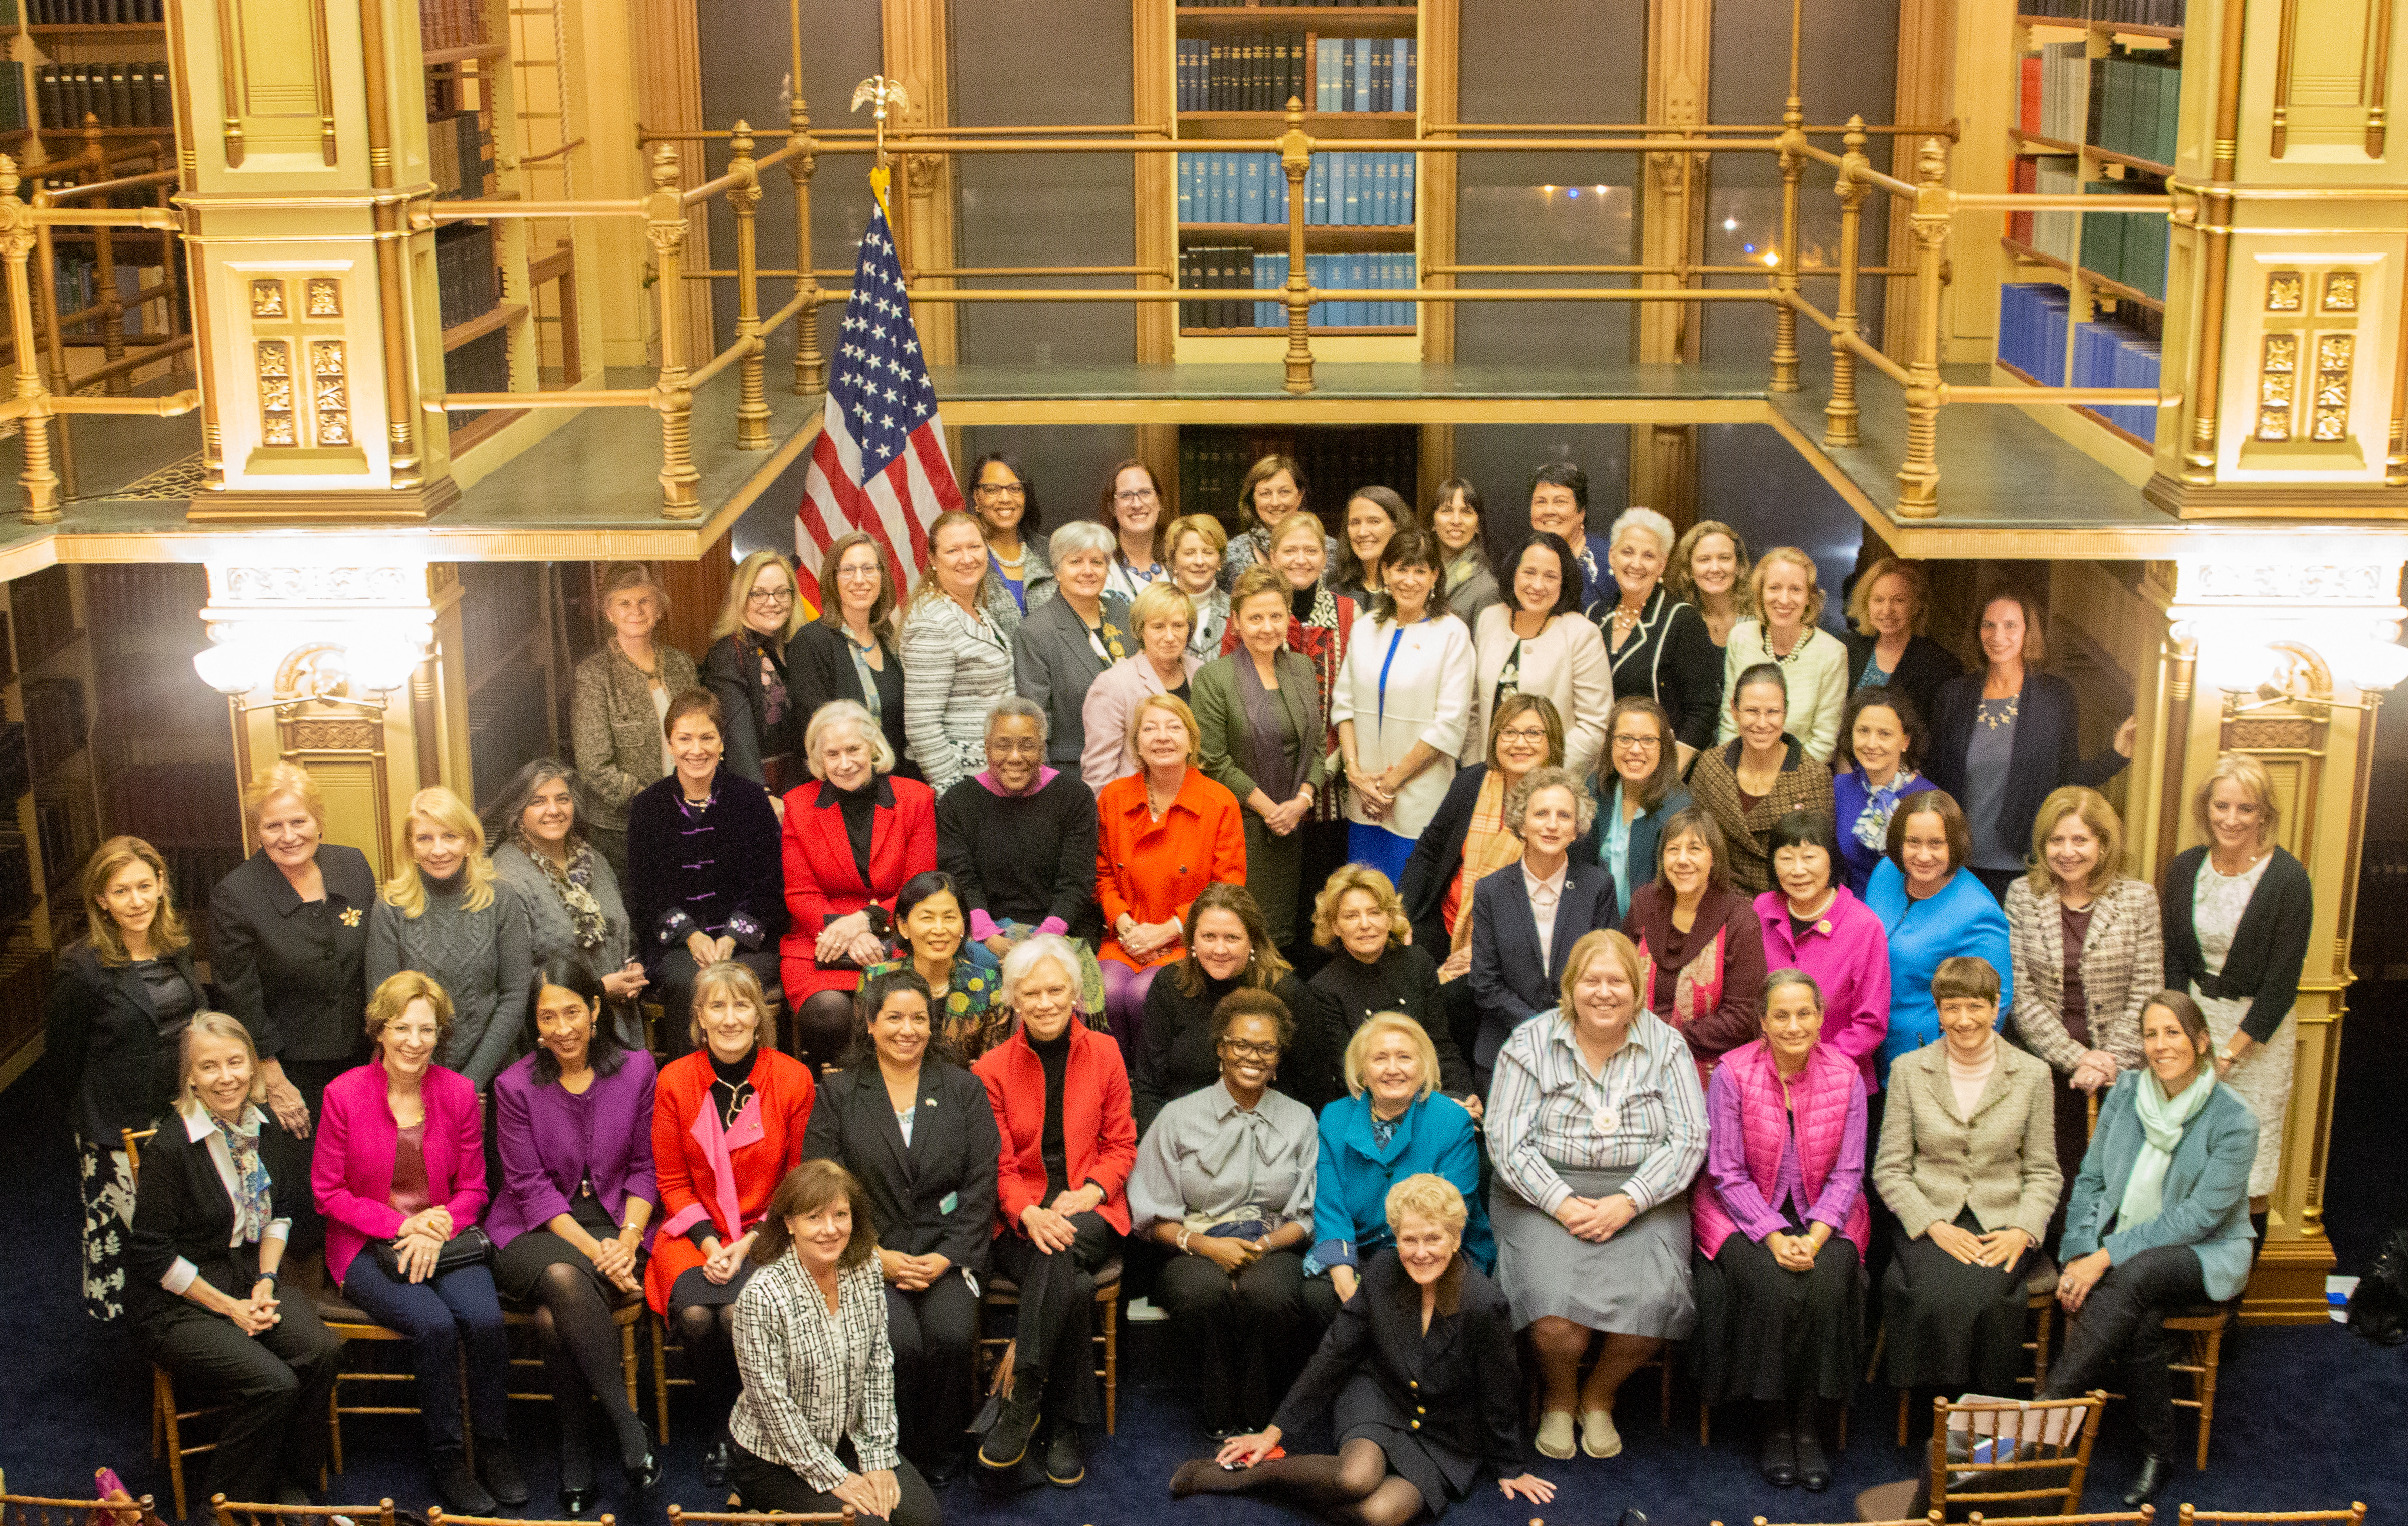 Women ambassadors gather at Georgetown